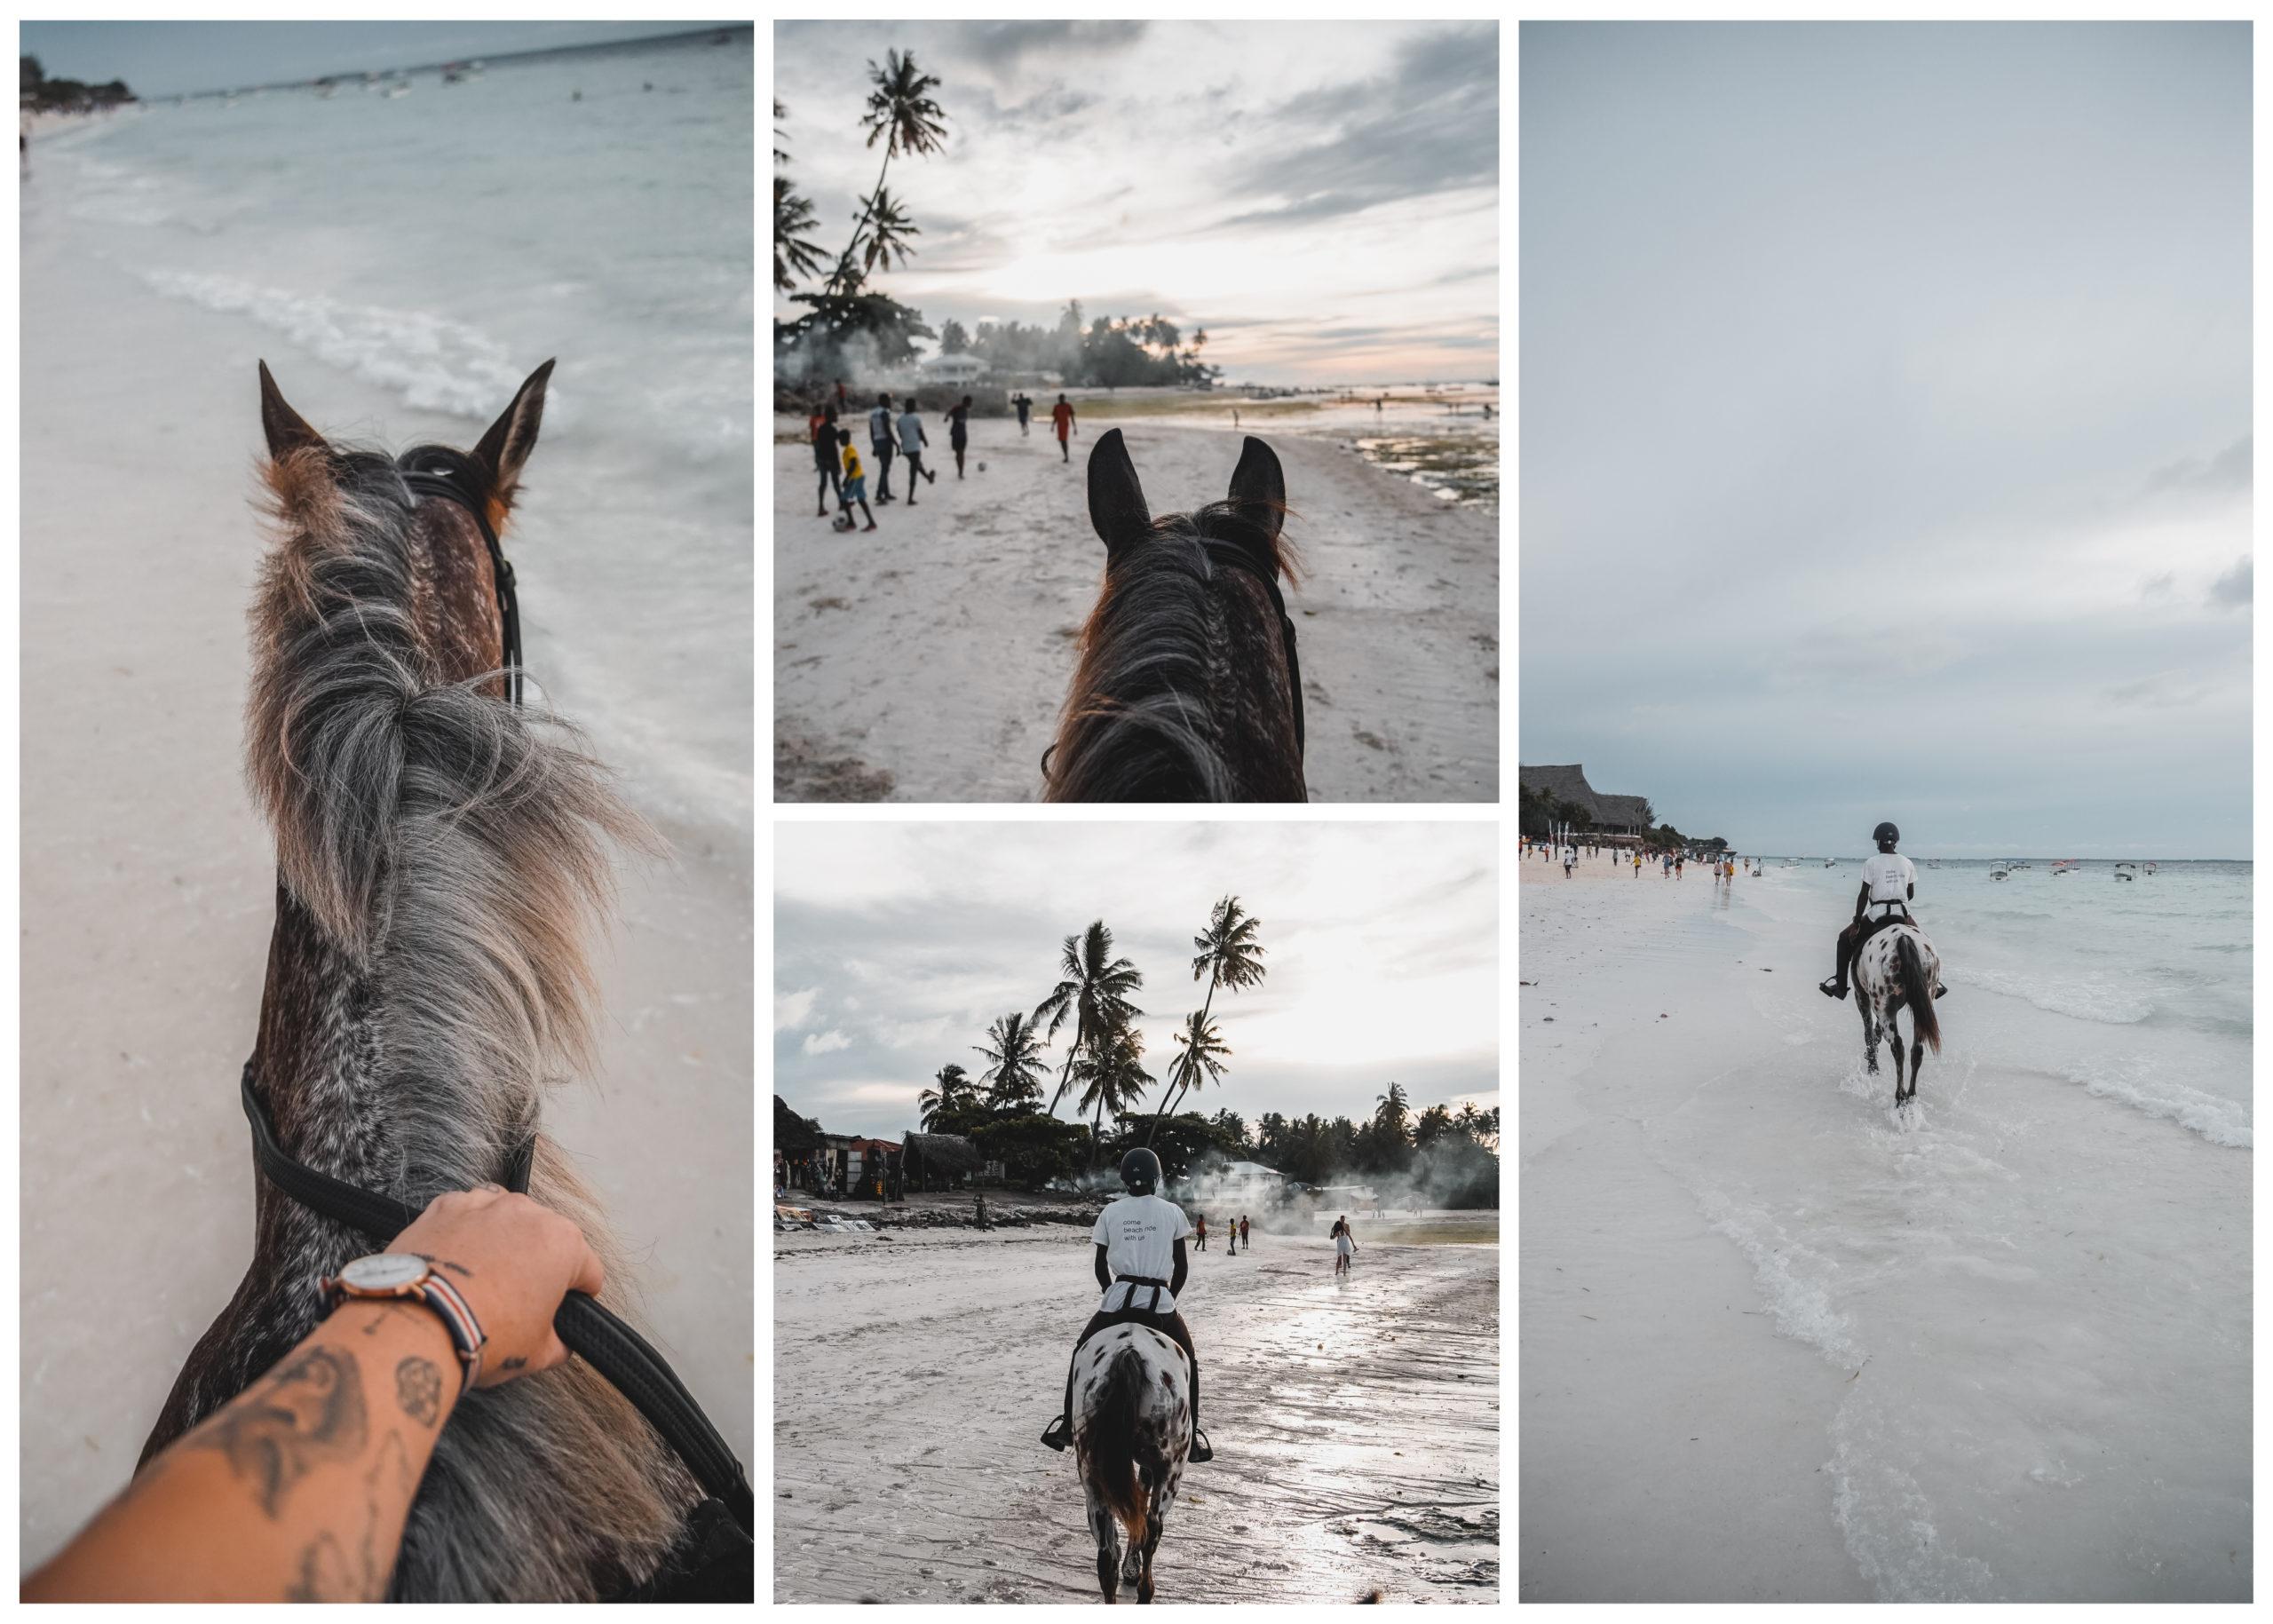 zanzibar horse cheval